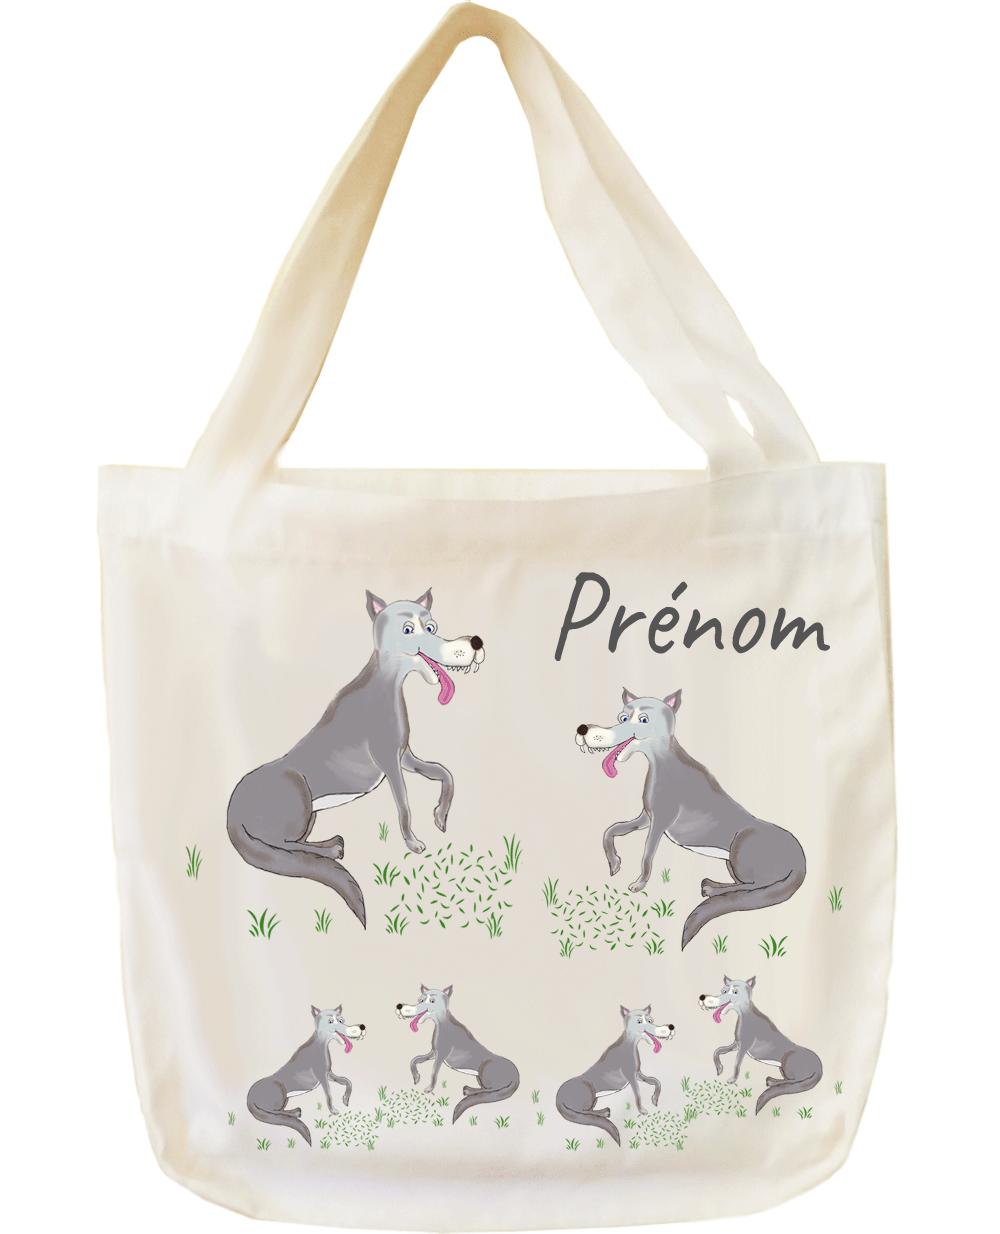 tote-bag;sac;cabas;texti;cadeaux;personnalisable;personnalisation;personnalise;prenom;animal;loup